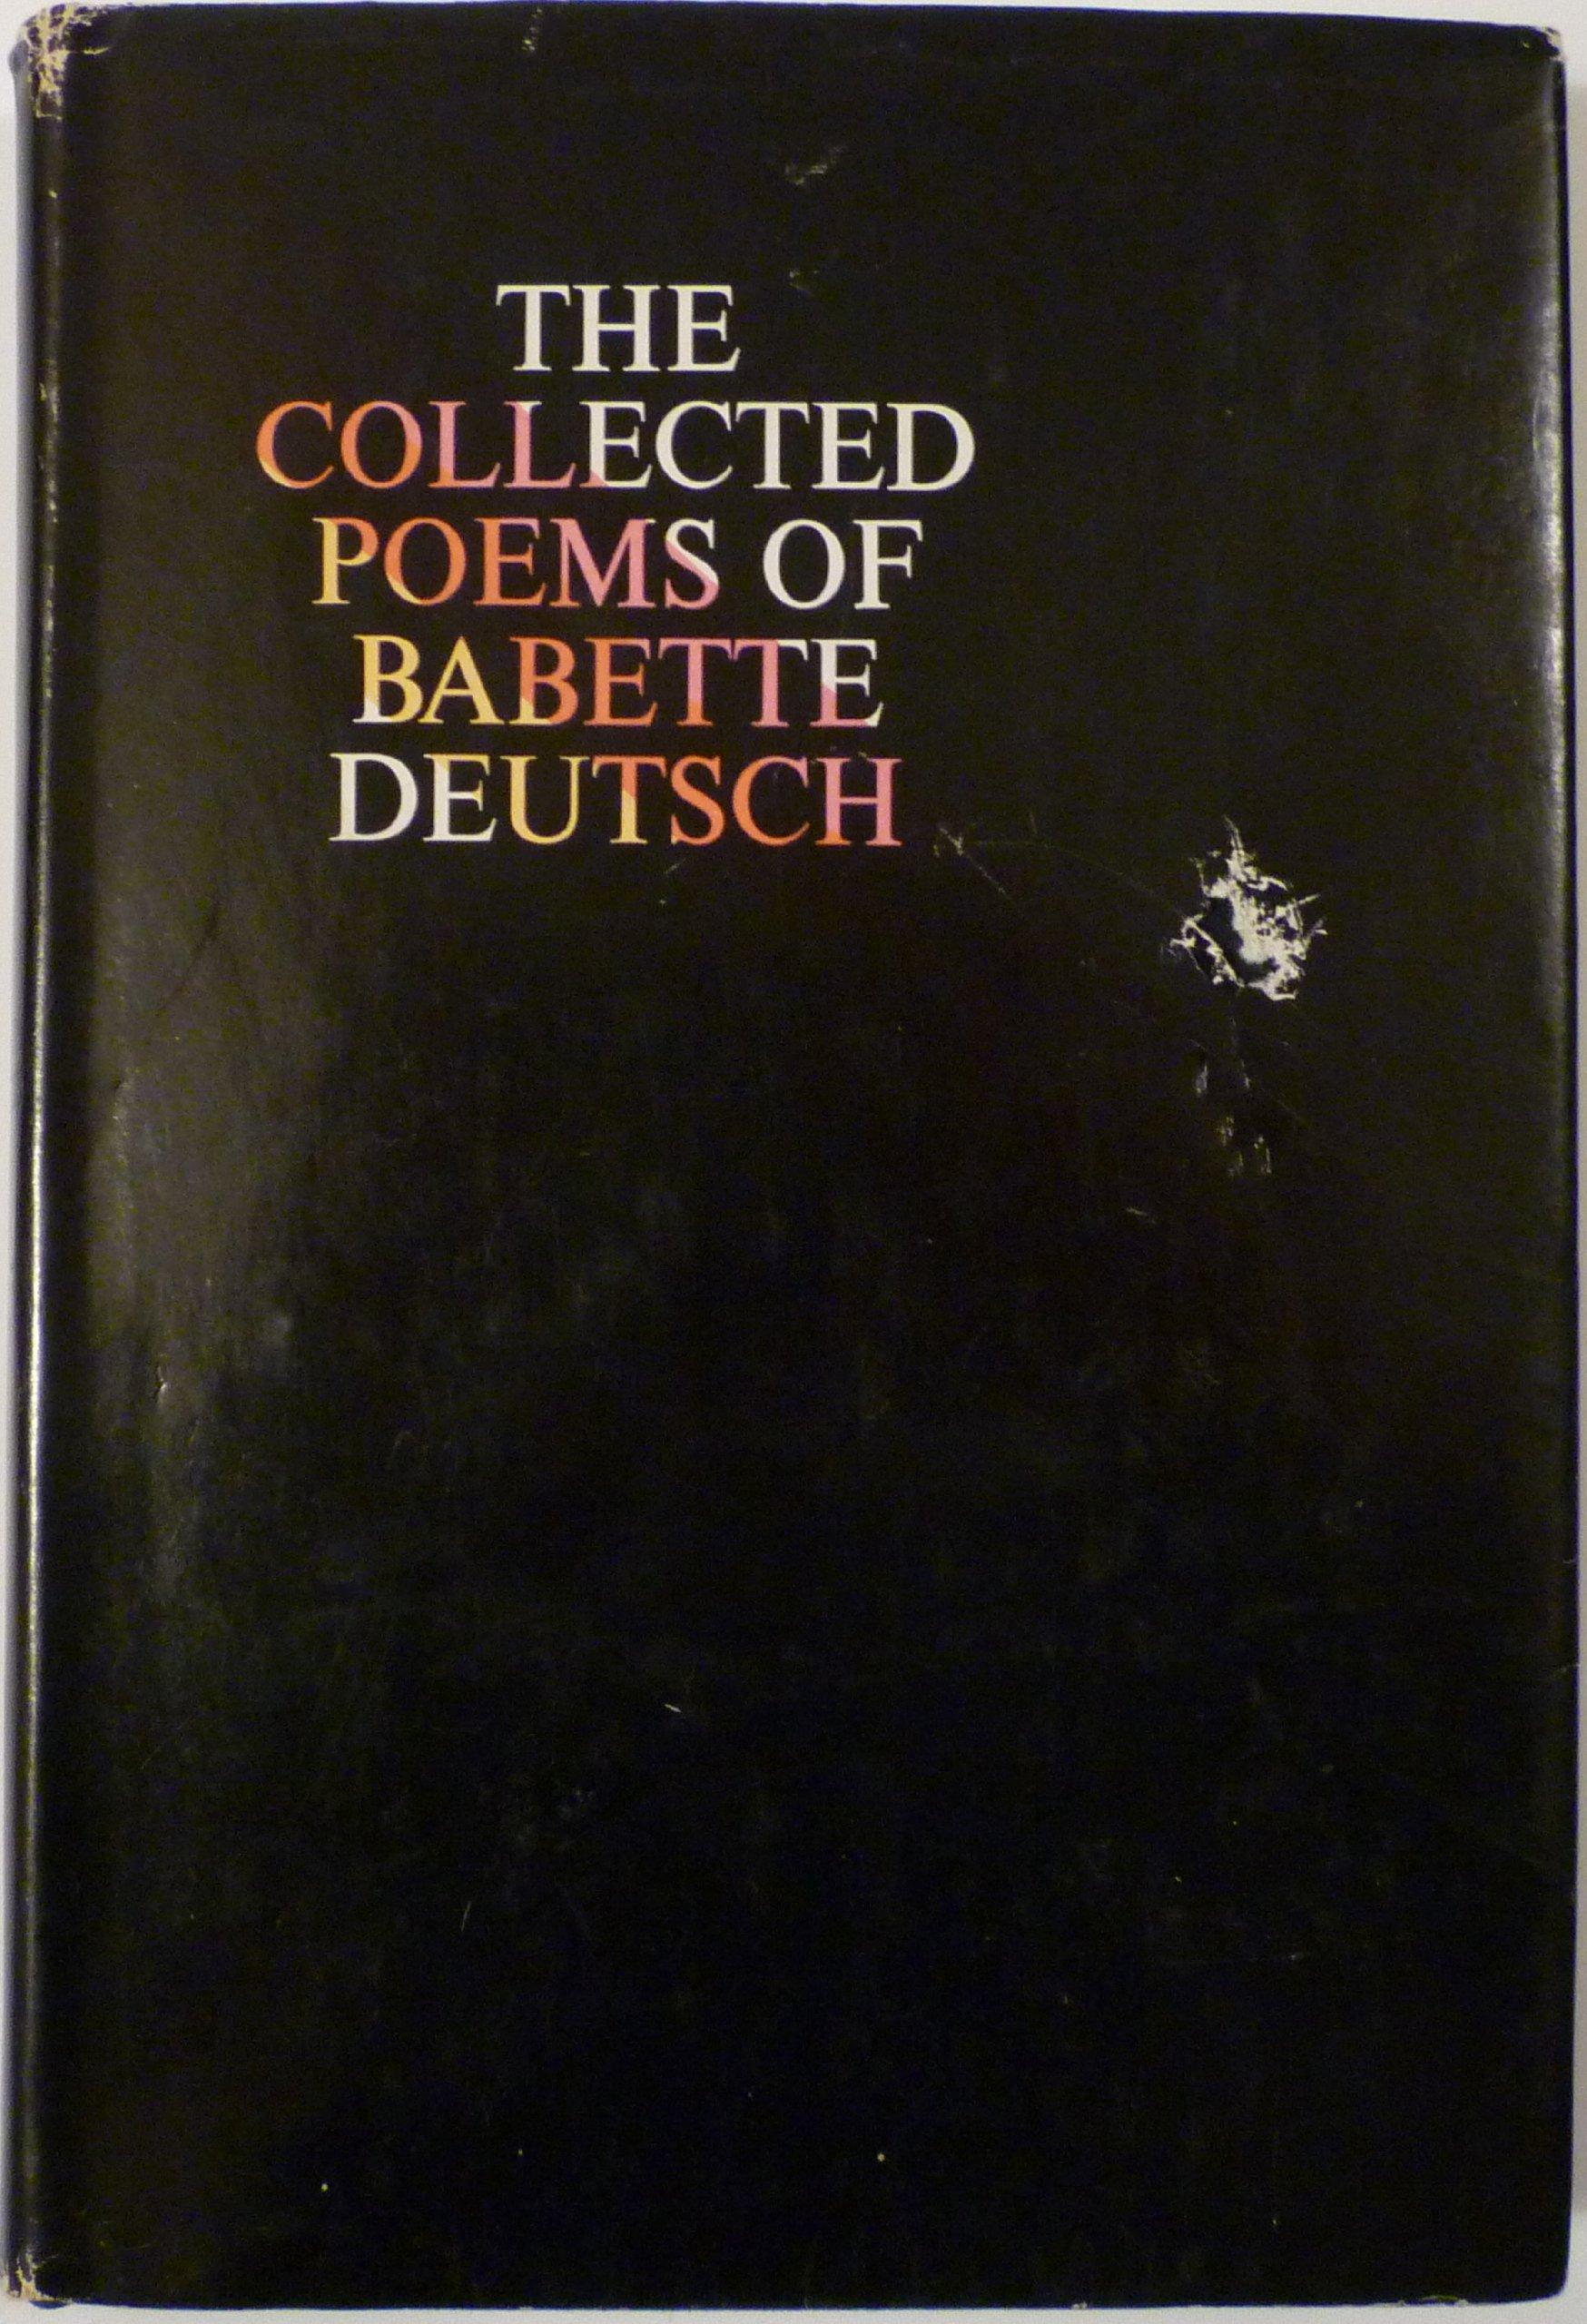 Babette Deutsch dictionary